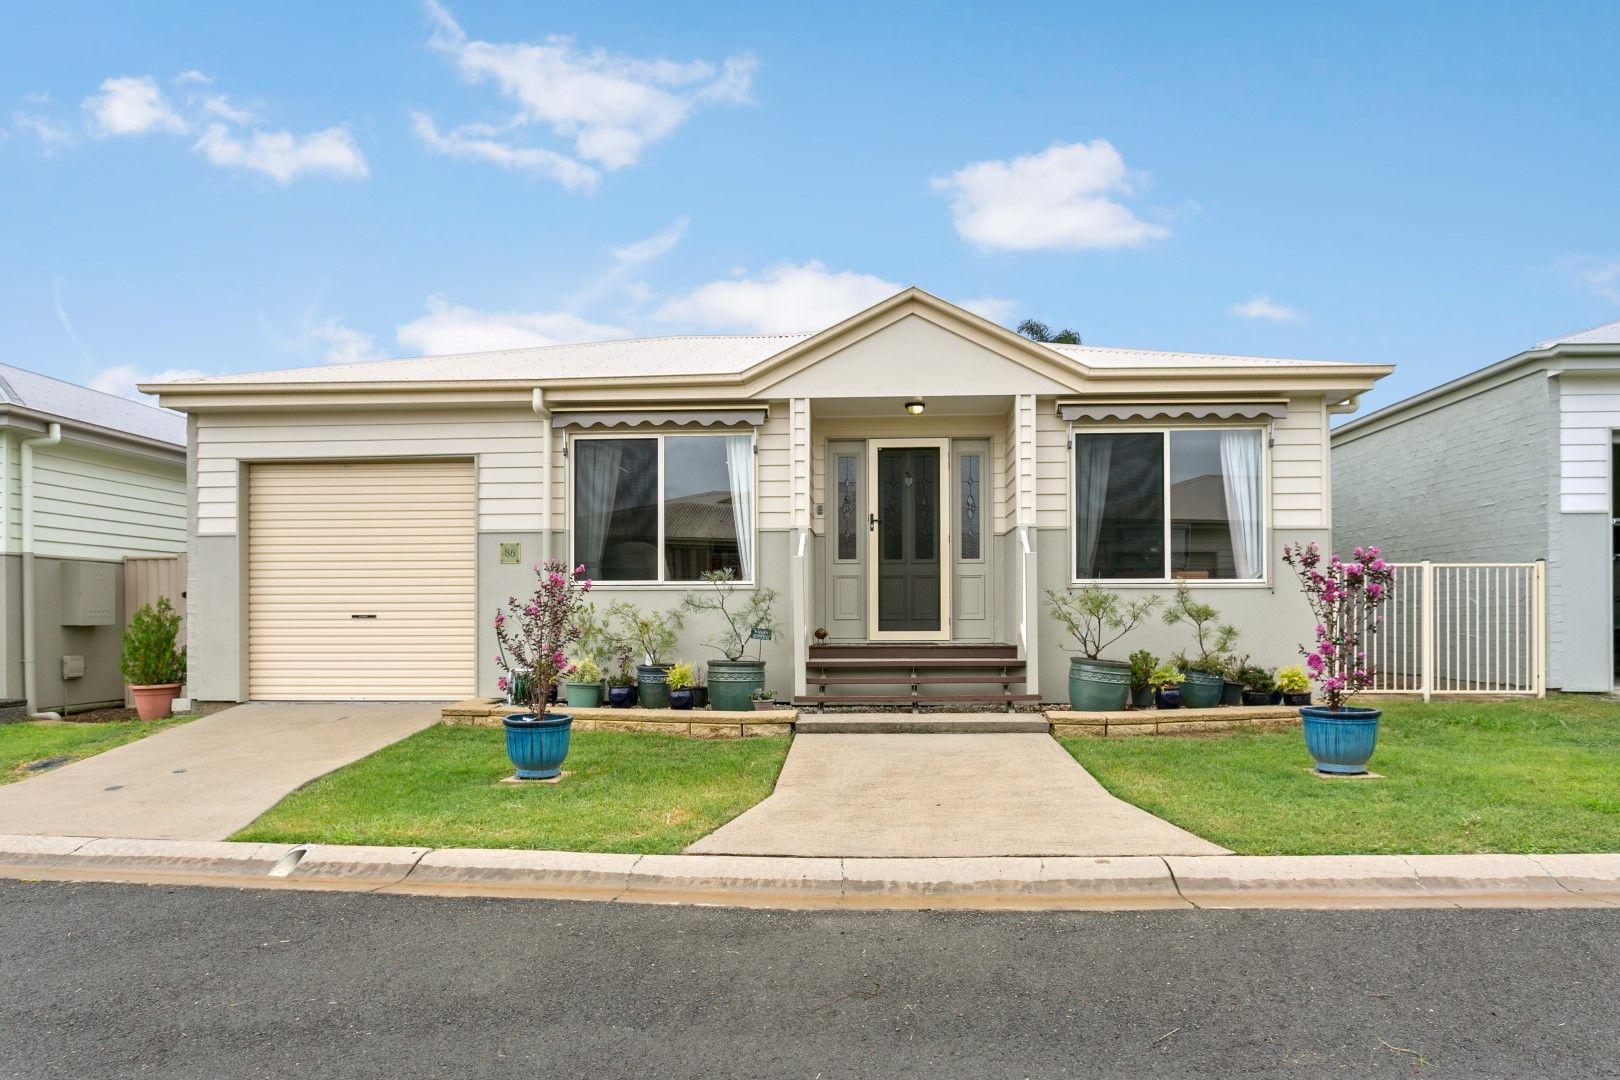 86/45 Sealy Street, Silkstone QLD 4304, Image 0